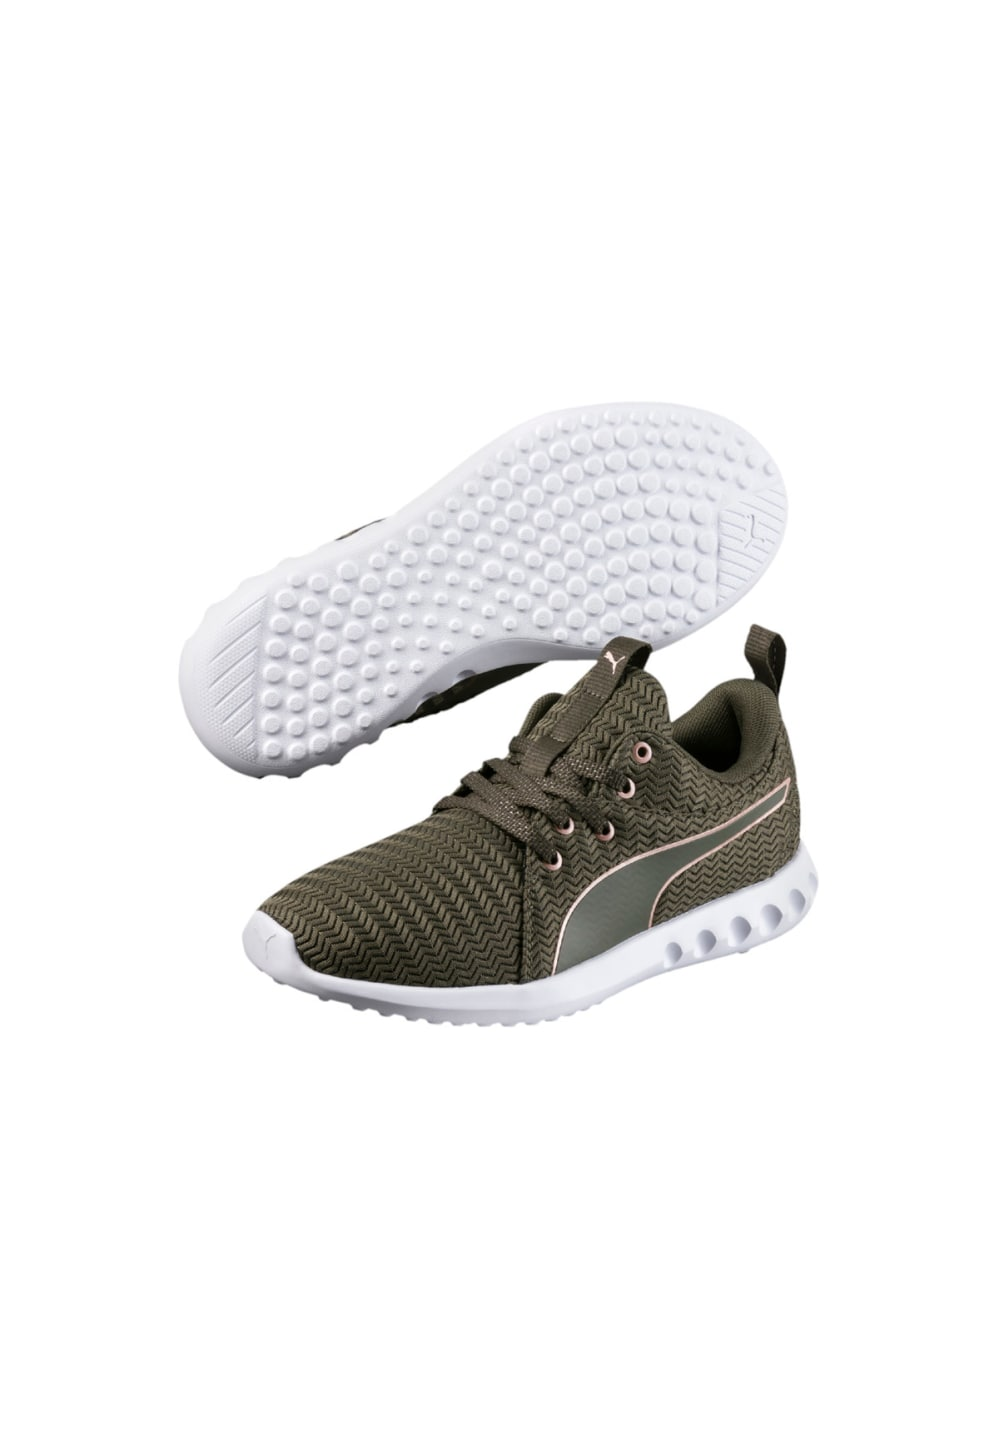 Puma Carson 2 Femmes Chaussures running